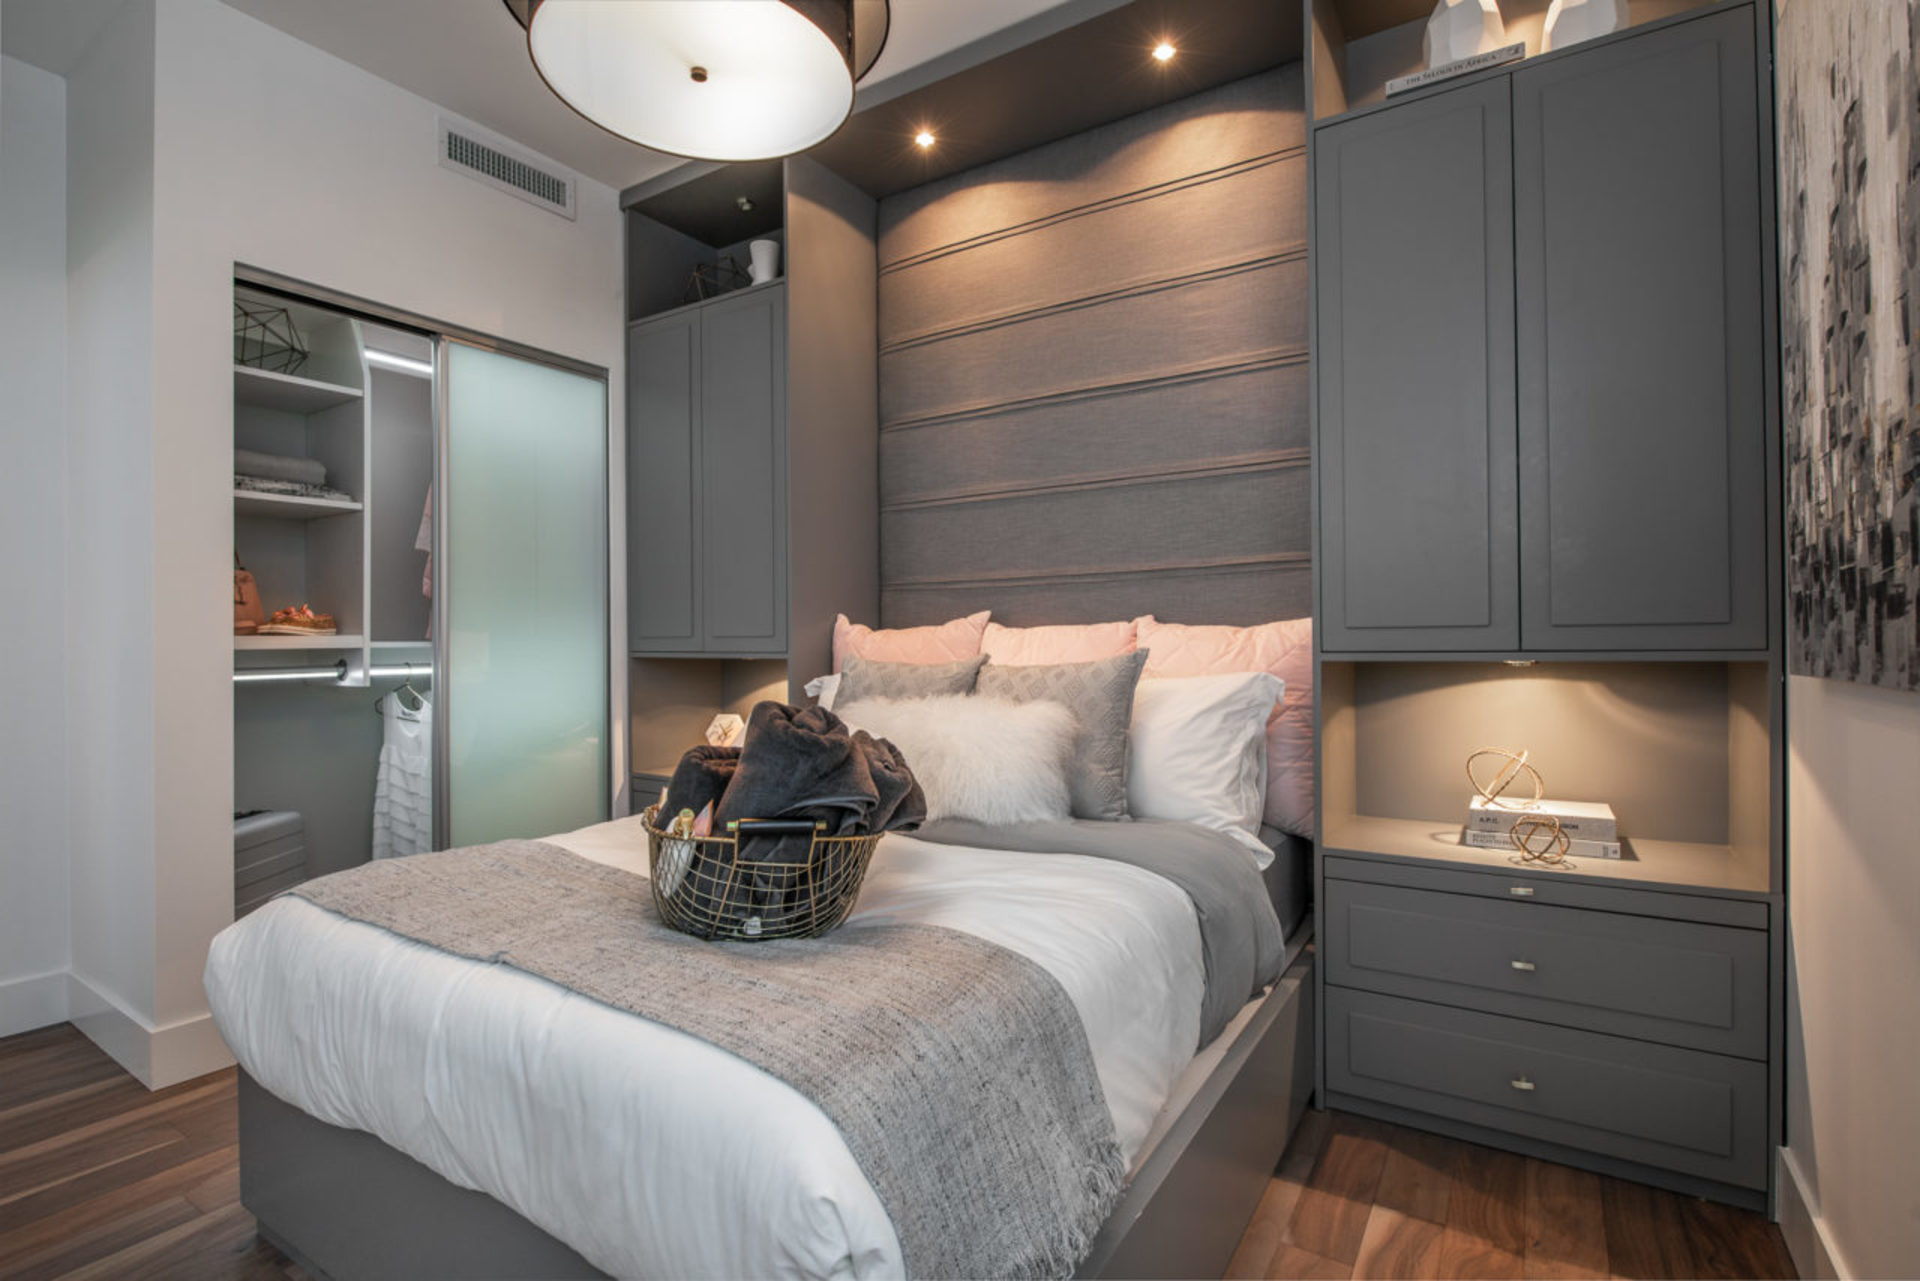 park-west-bedroom at Park West at Lions Gate Village (1633 Capilano Road, North Vancouver)